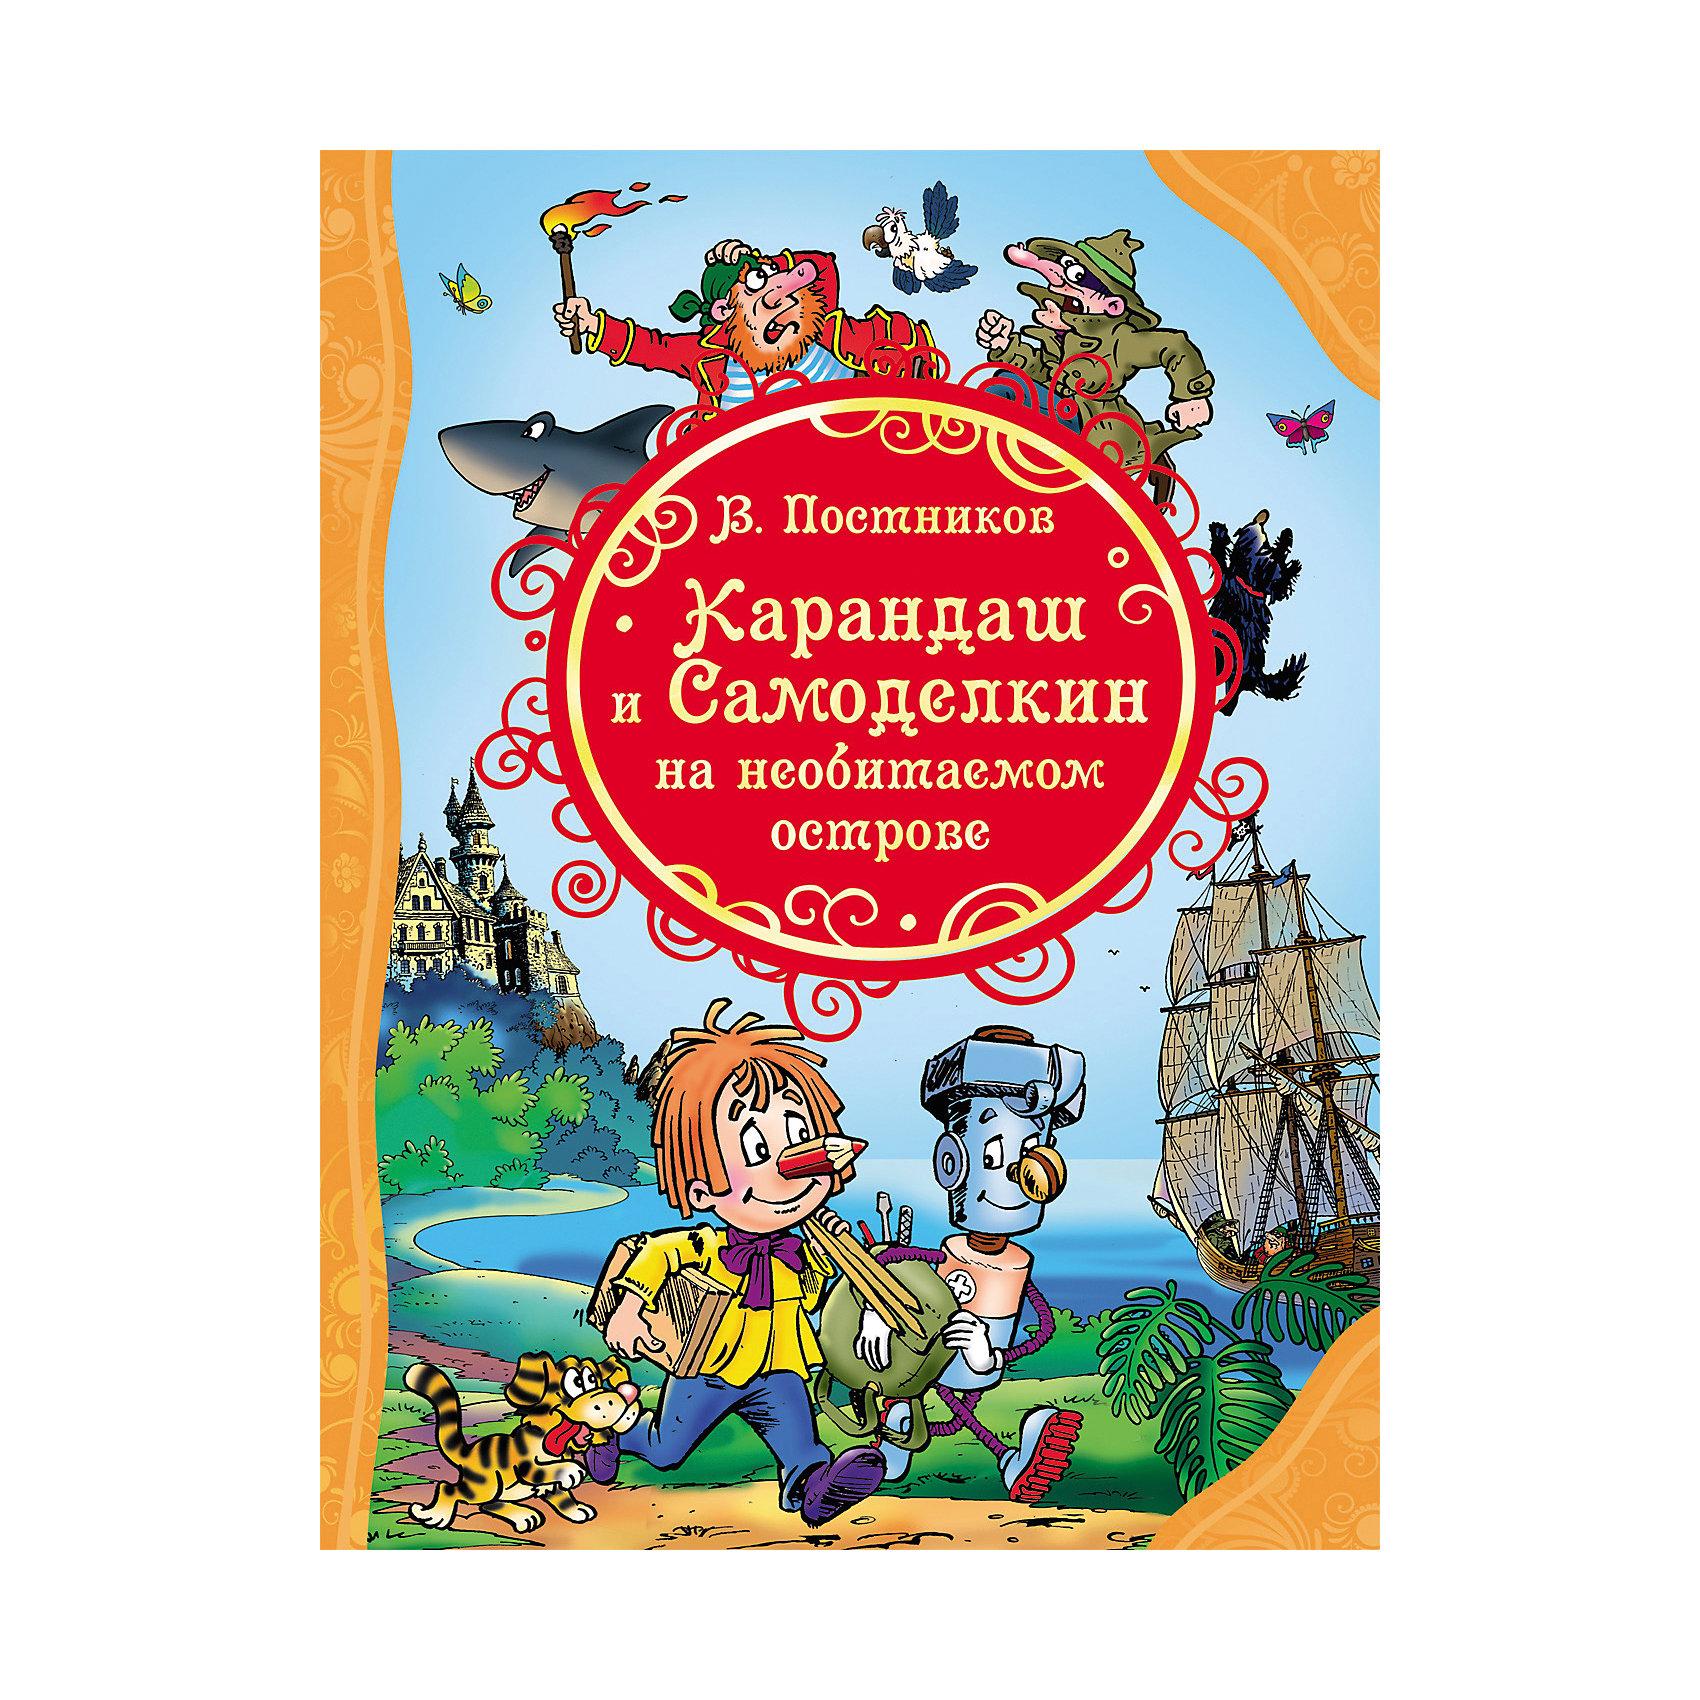 Росмэн Карандаш и Самоделкин на Необитаемом острове постников в ф карандаш и самоделкин против злодейкина